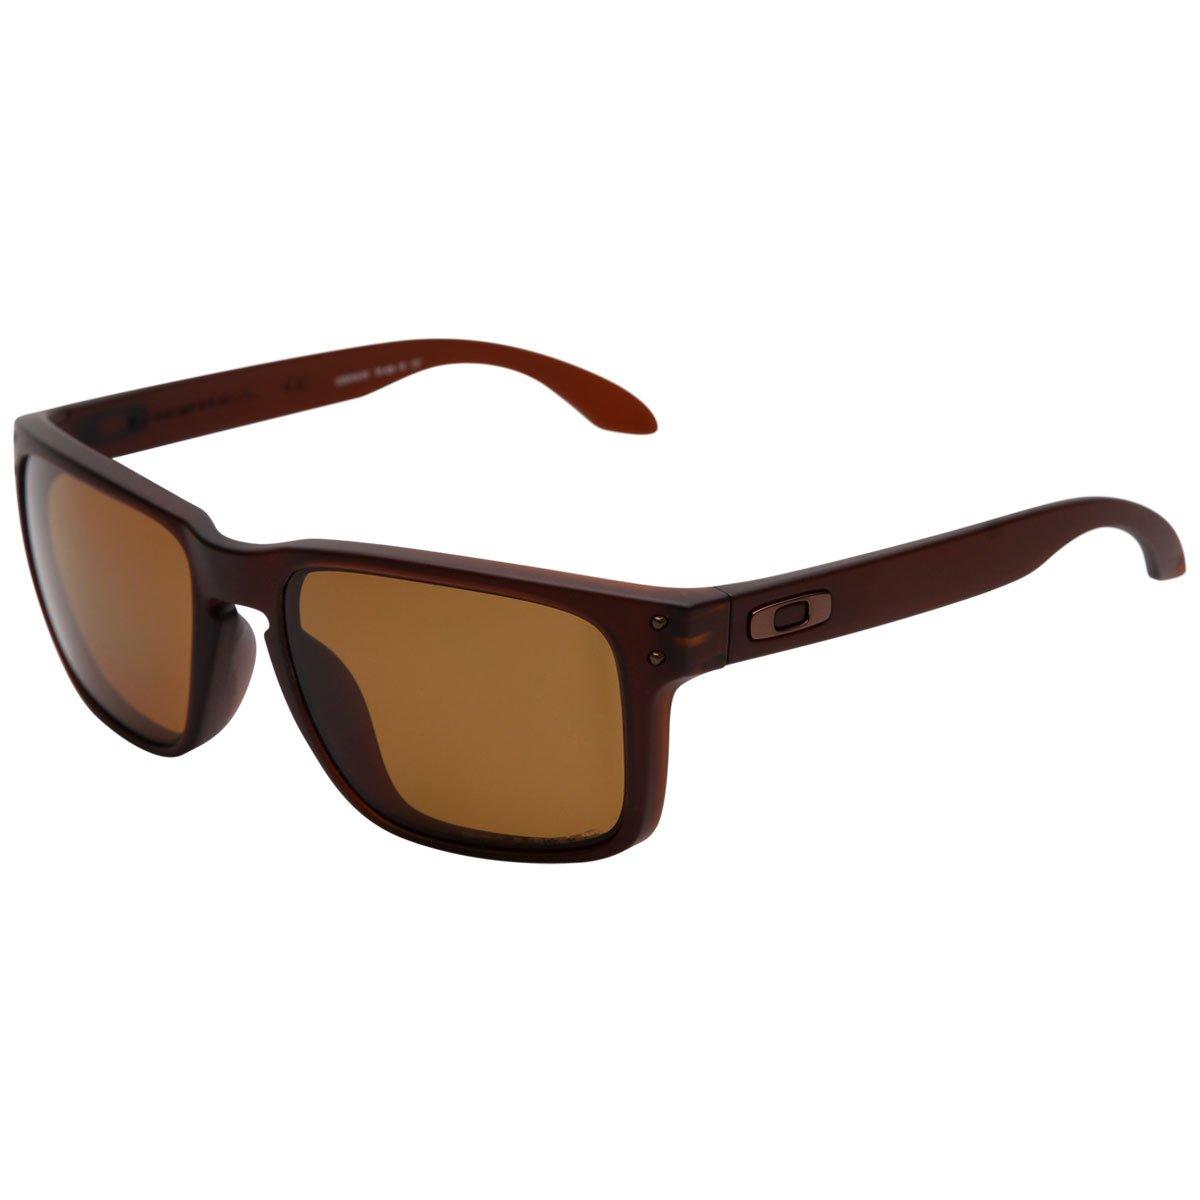 23eecc80c5bf0 Óculos de Sol Oakley Holbrook Masculino - Marrom - Compre Agora ...